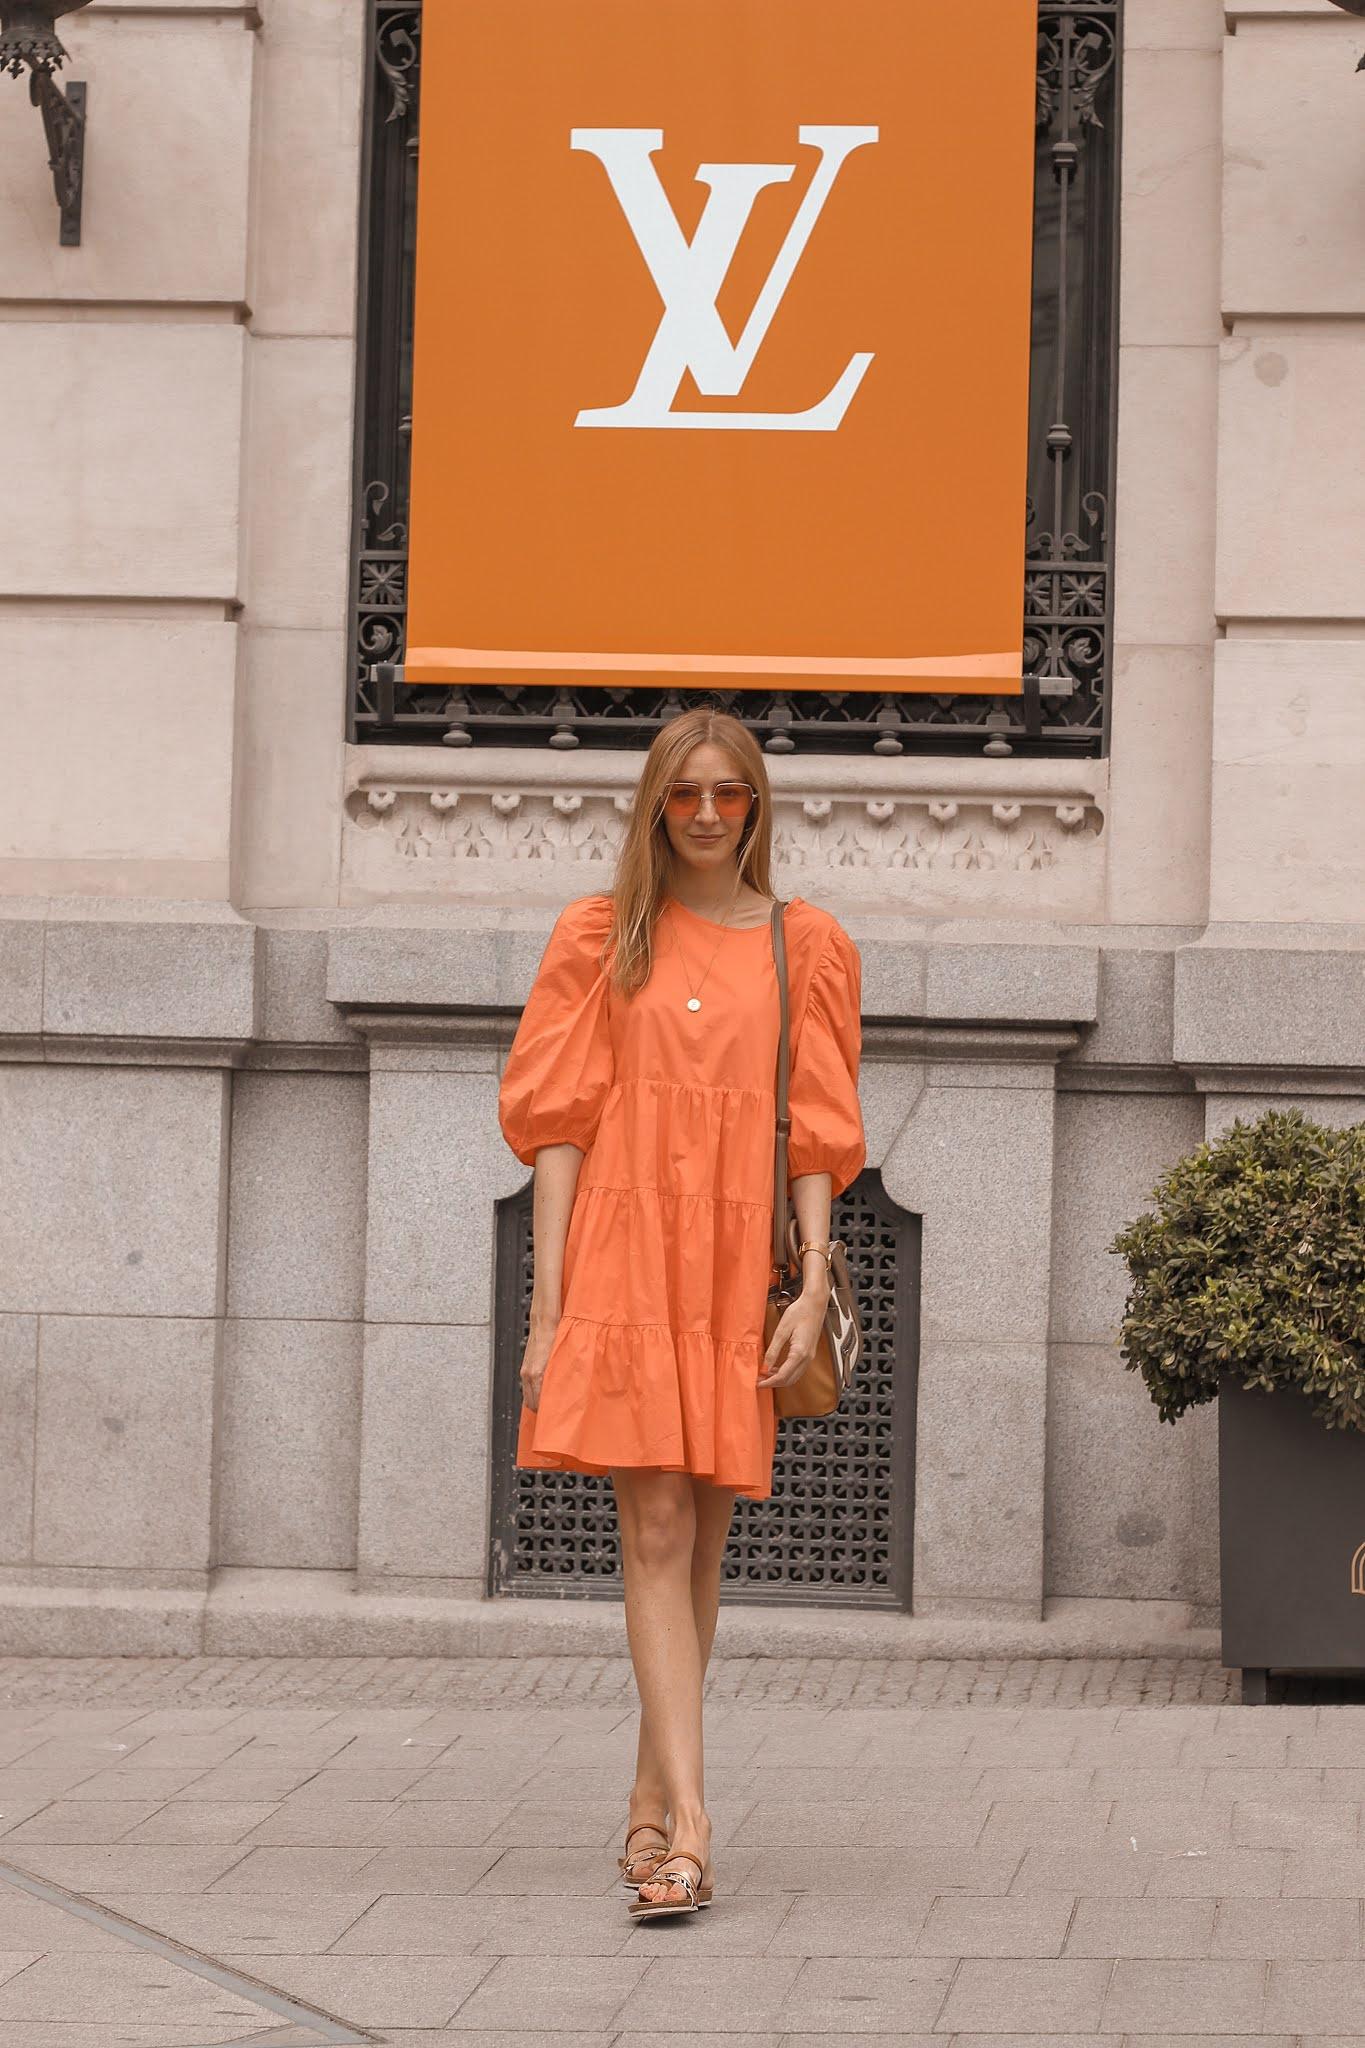 vestido-anonyme-naranja-sandalias-yokono-gafas-hawkers-getafe-the-style-outlets